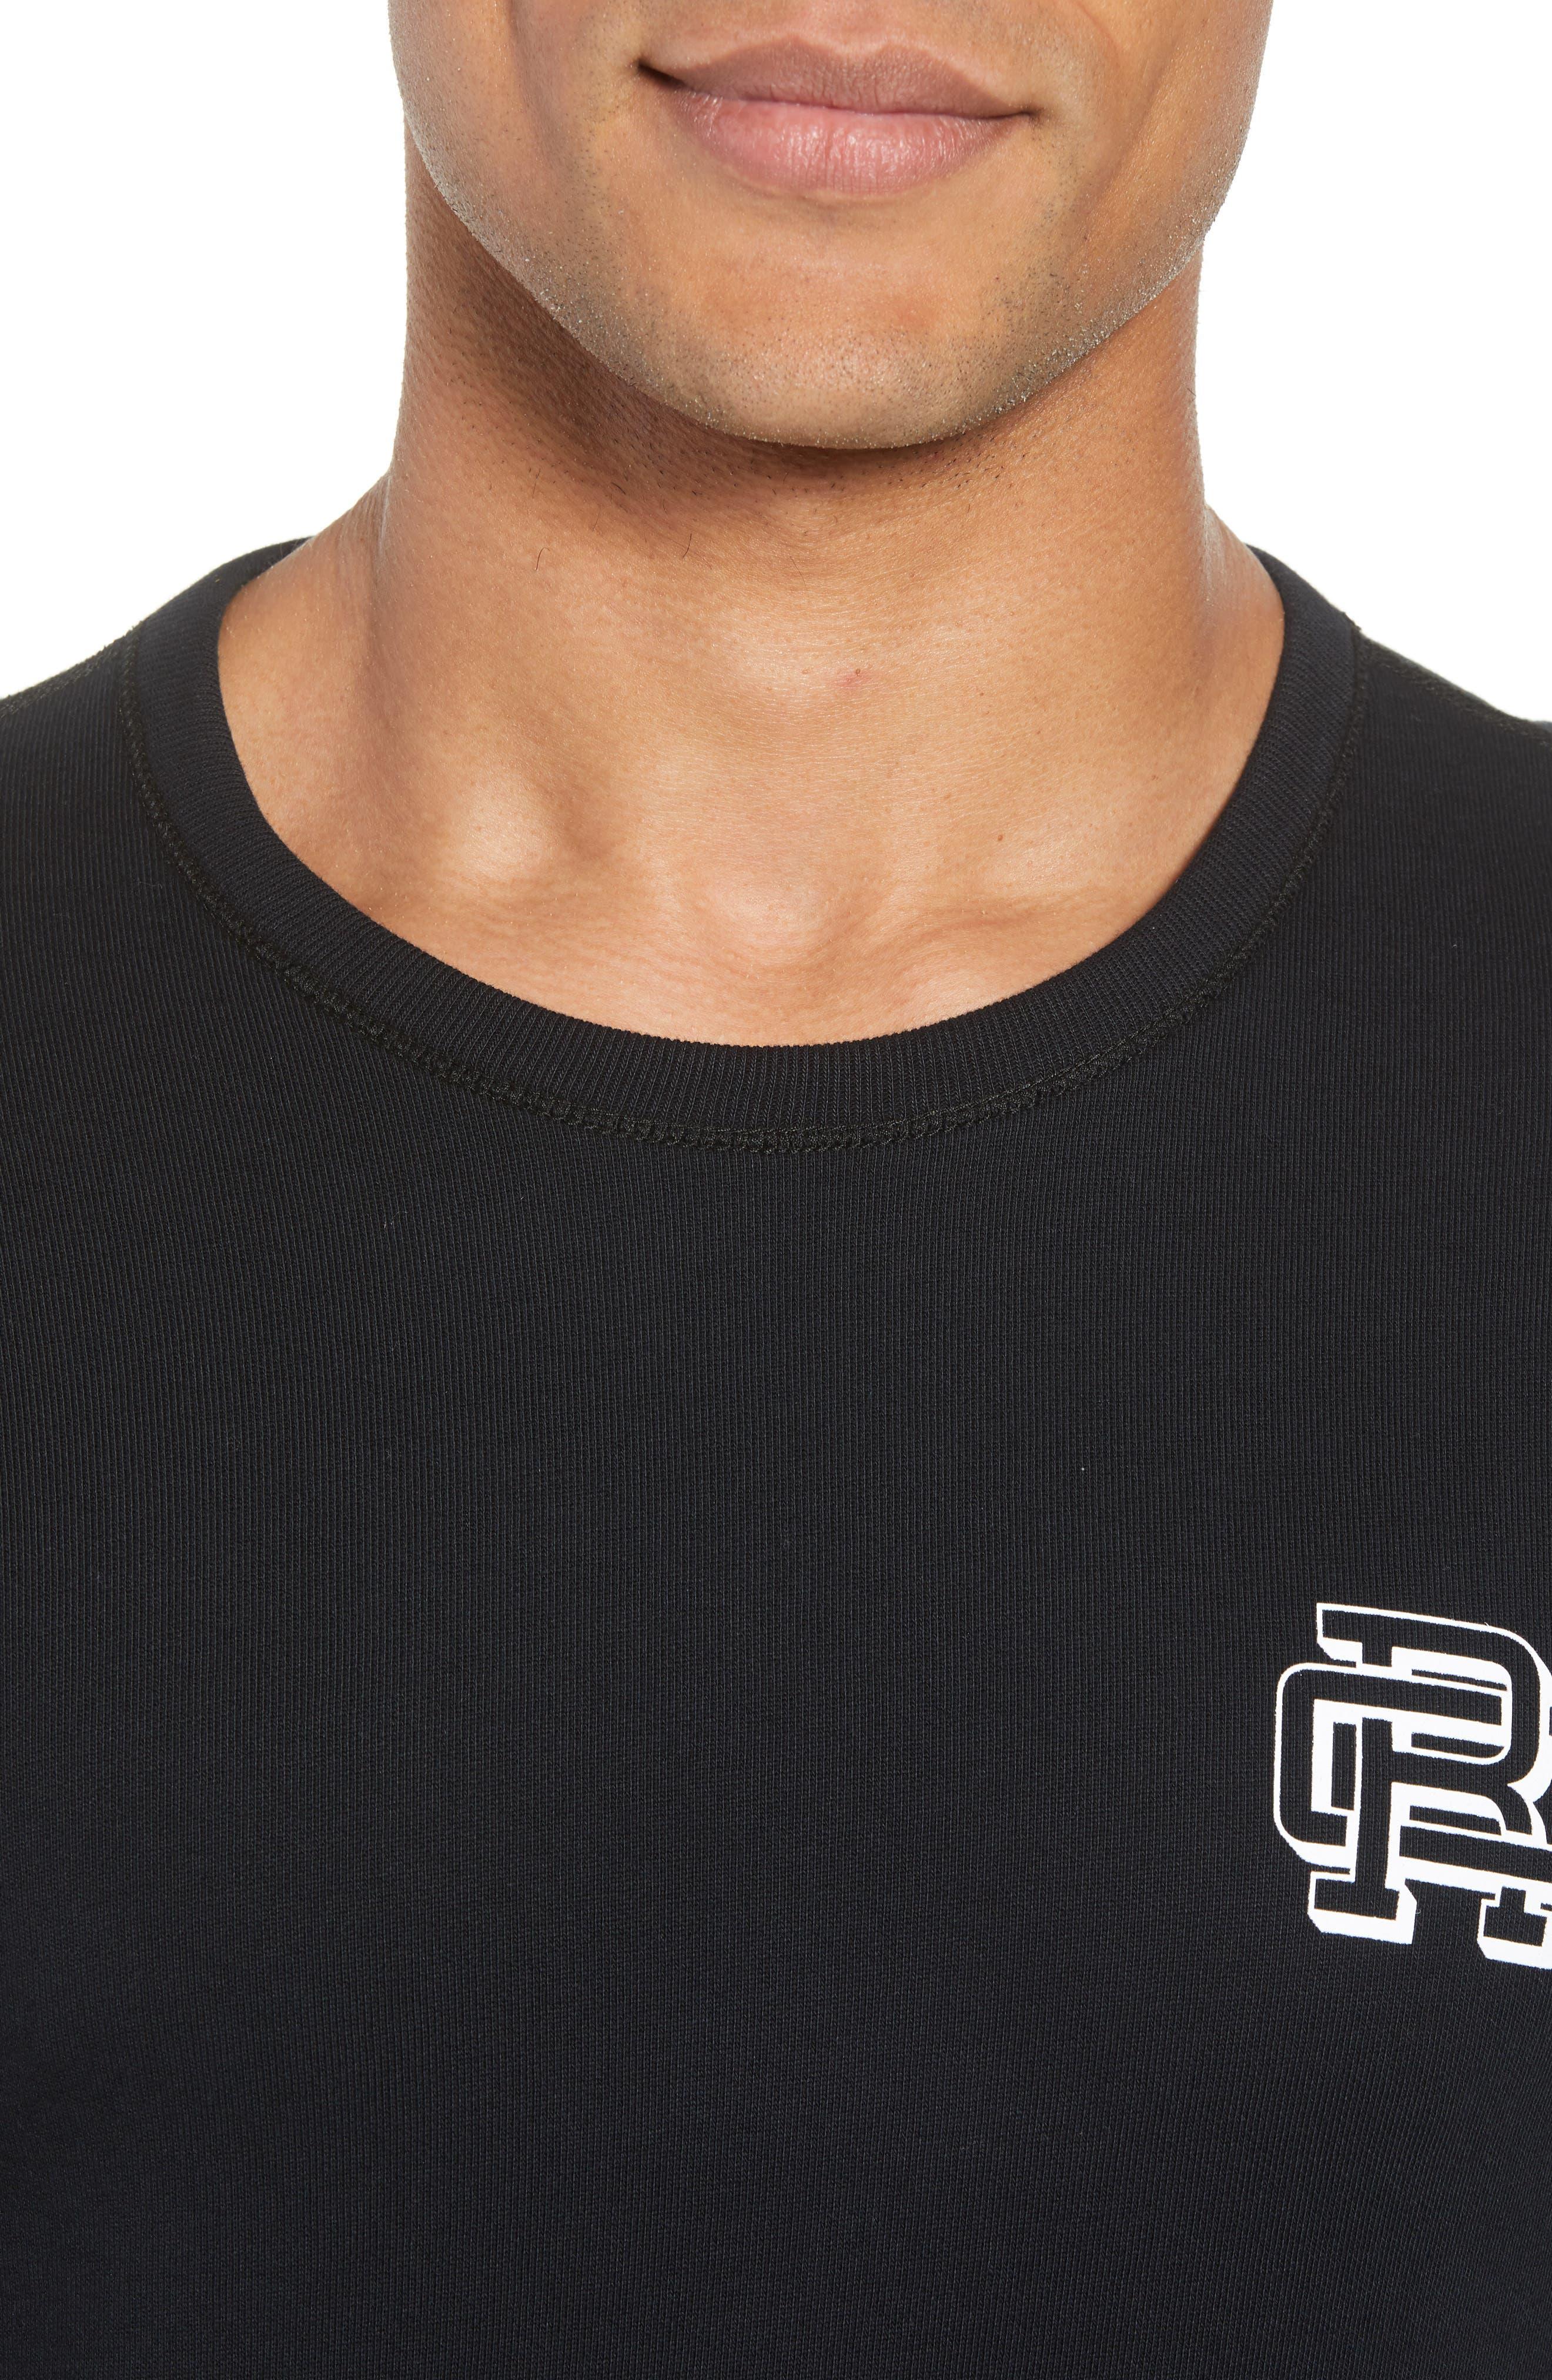 Lightweight Classic Fit Sweatshirt,                             Alternate thumbnail 4, color,                             BLACK